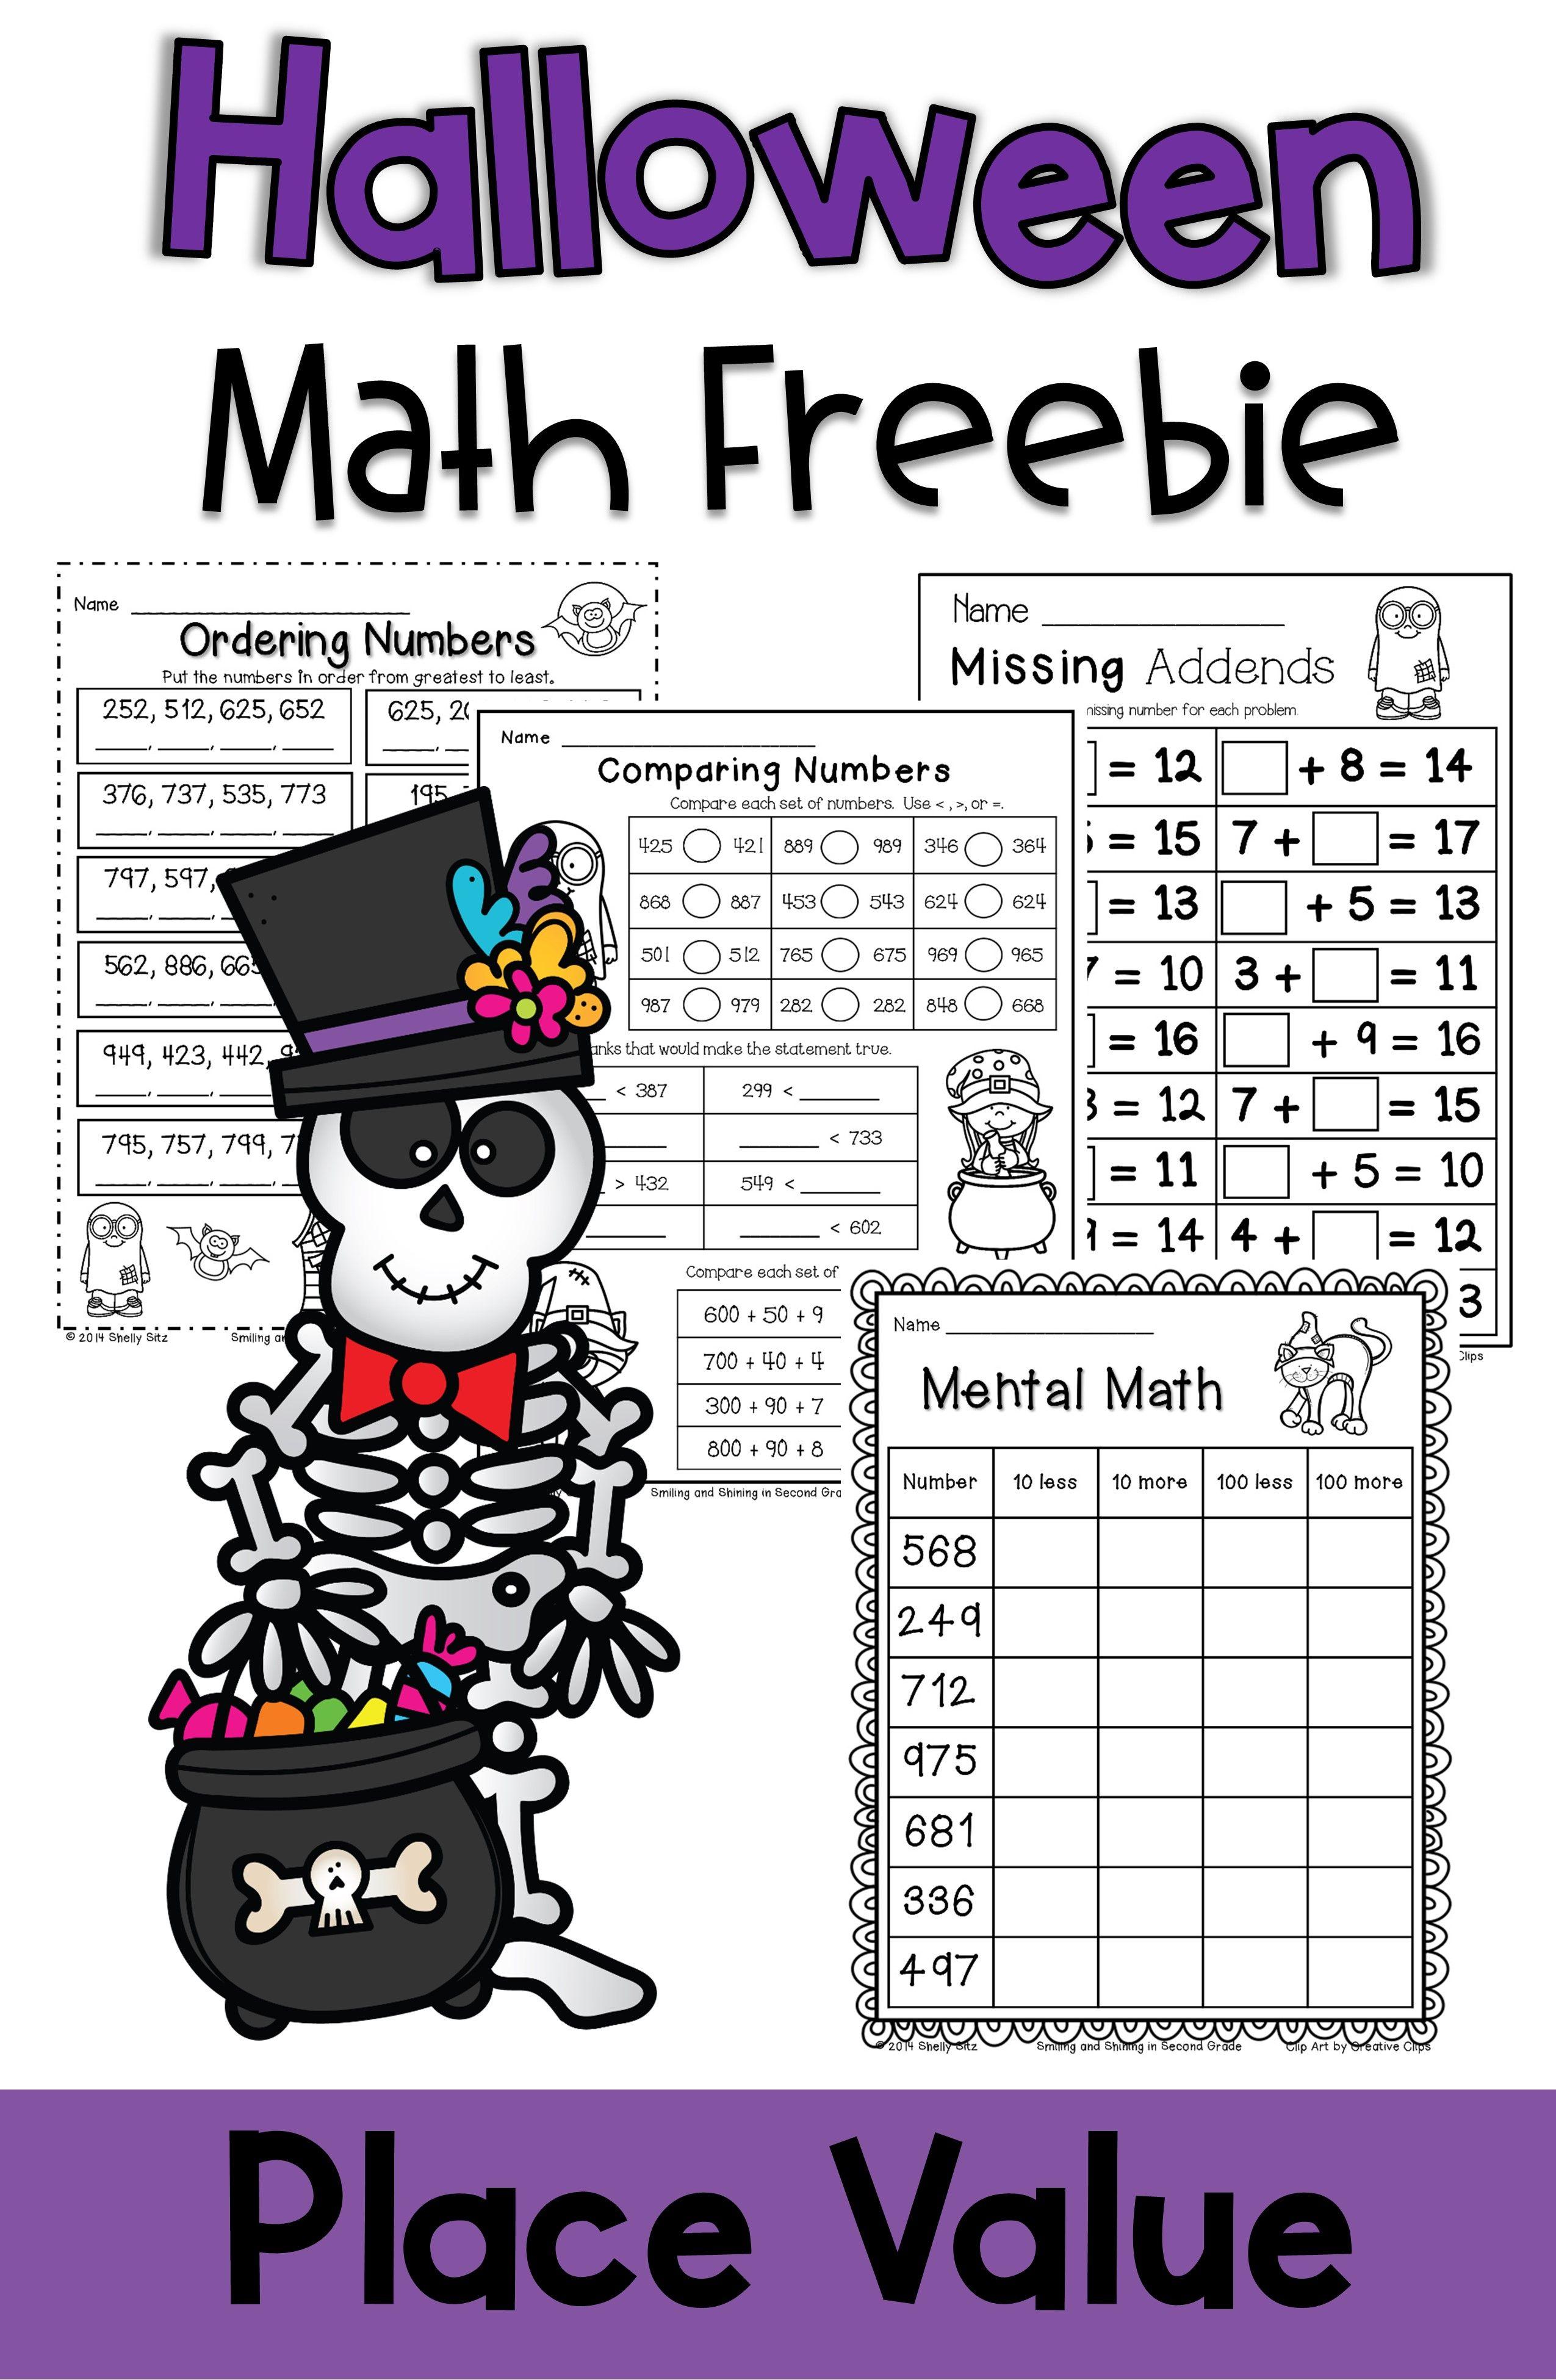 Halloween Math Freebie Math Freebie Halloween Math Halloween Math Worksheets [ 3900 x 2550 Pixel ]